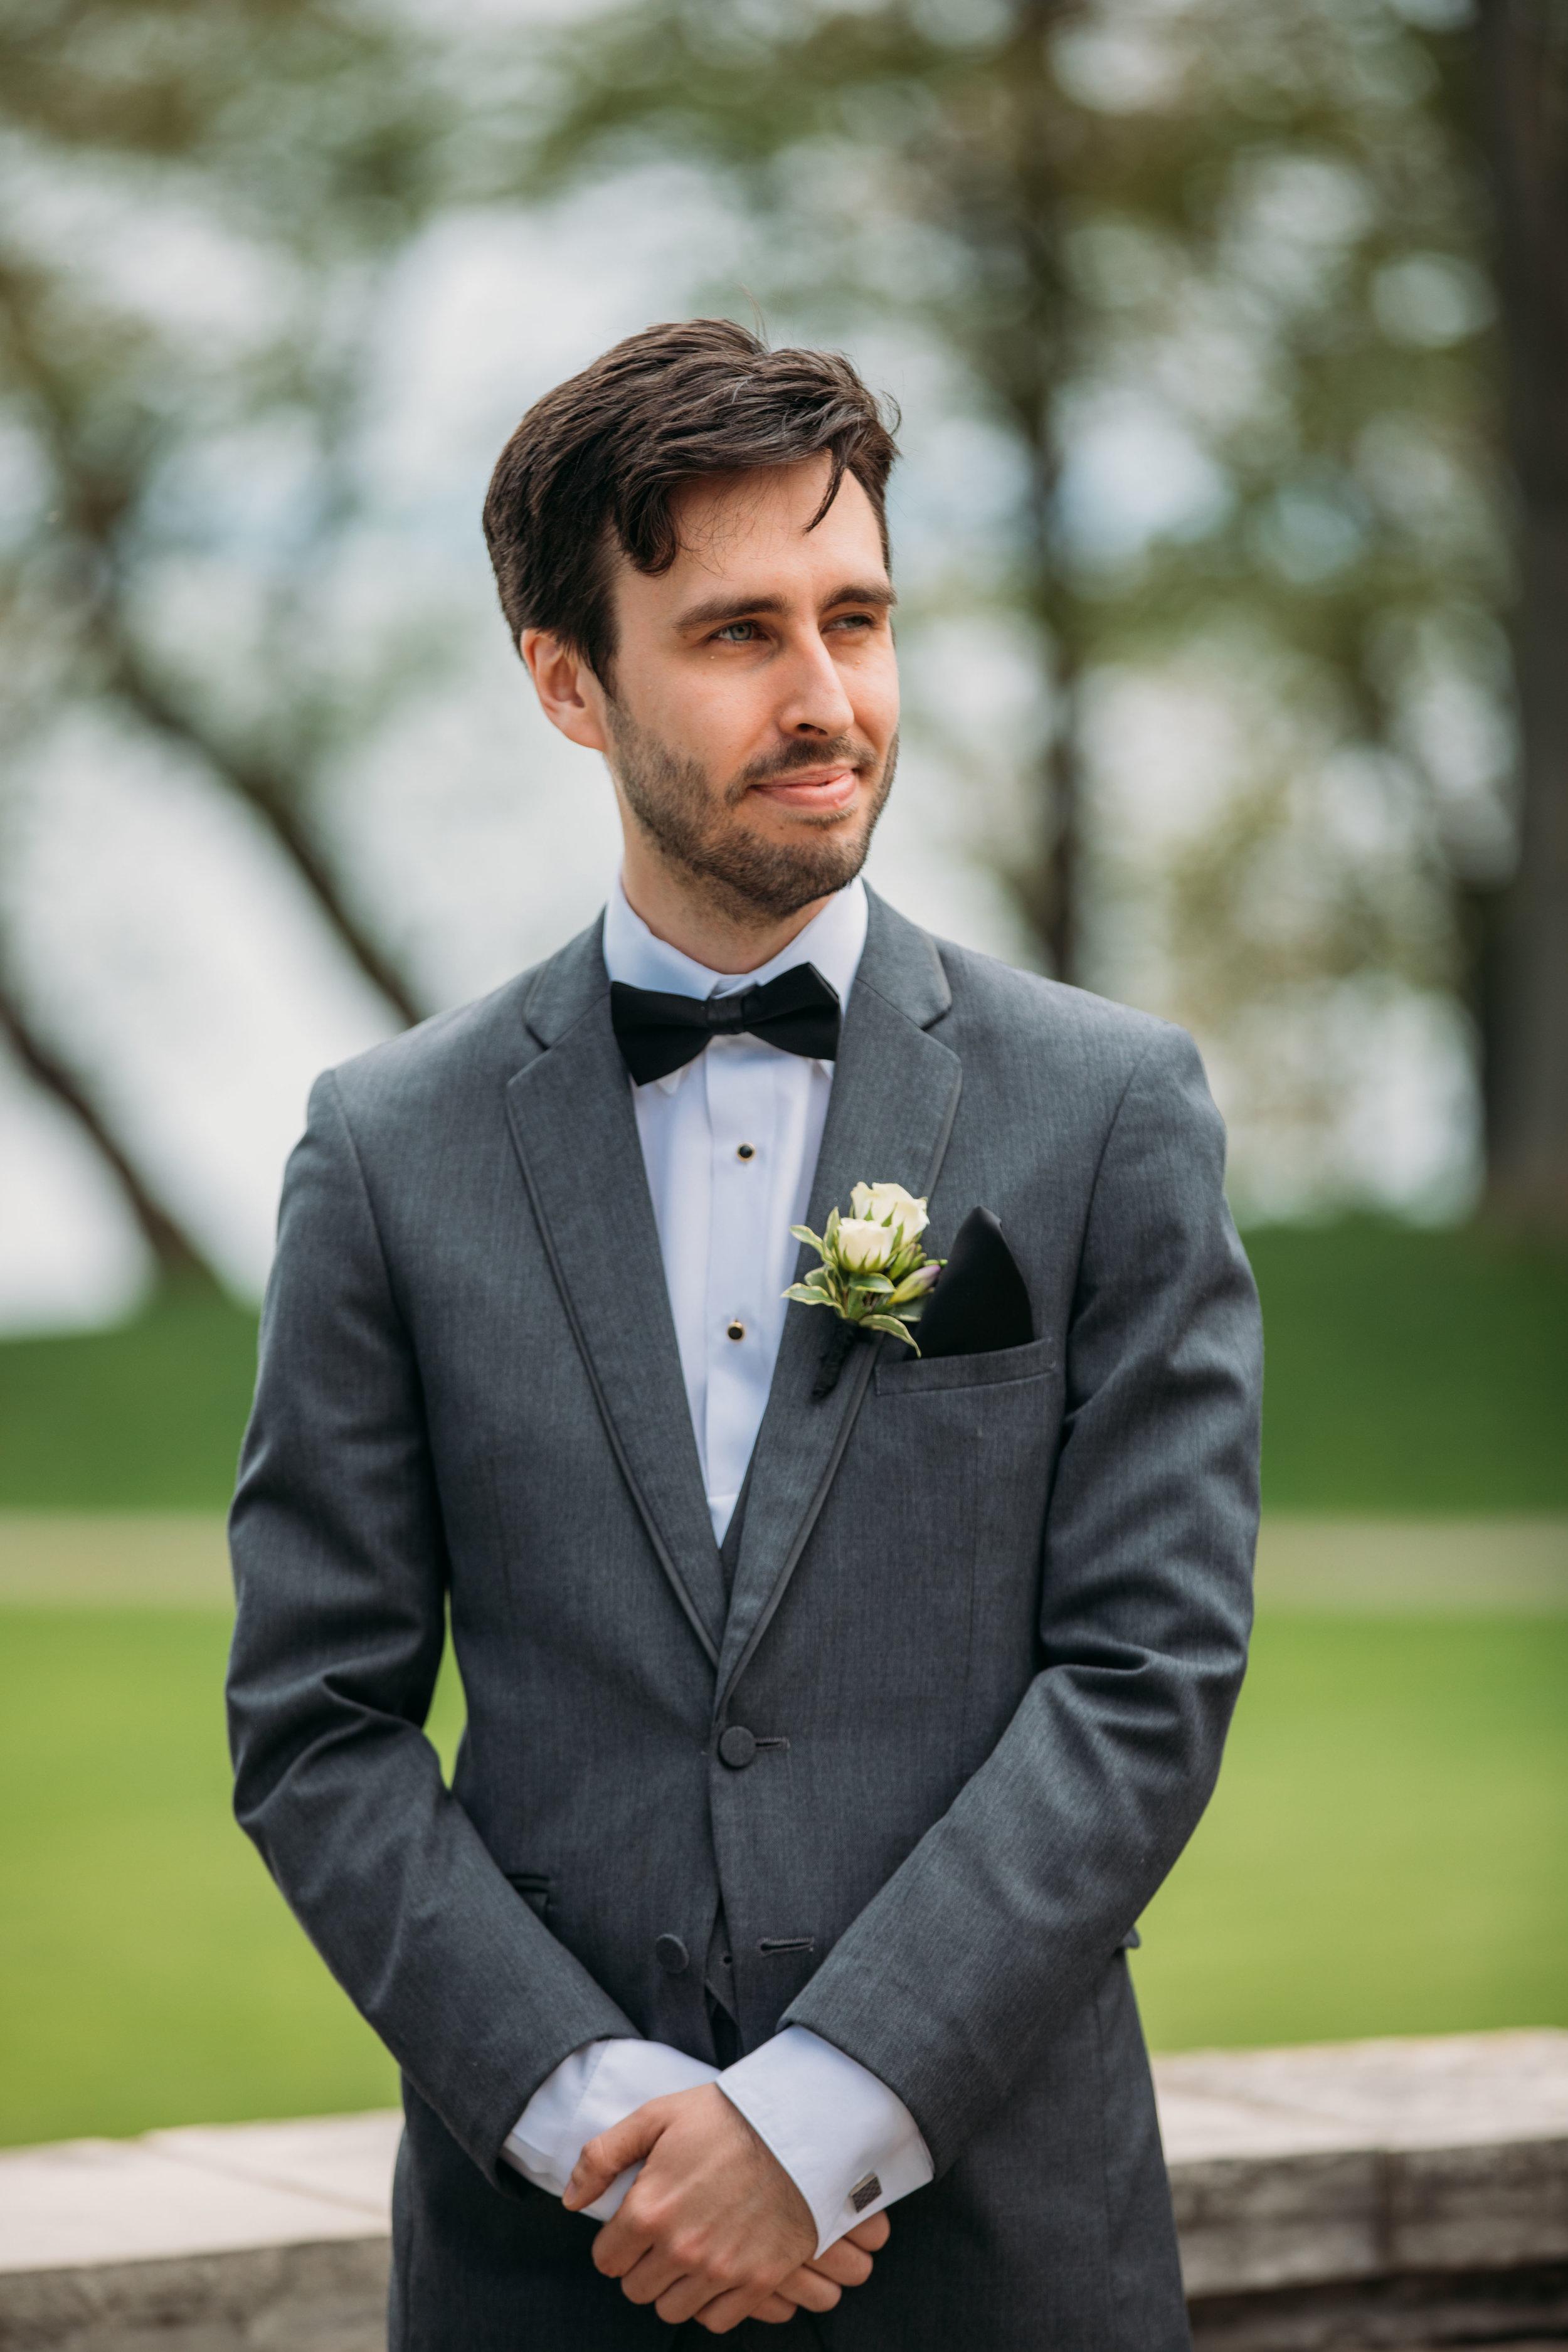 Paletta Mansion wedding, Burlington wedding photographer, Hamilton wedding photographer